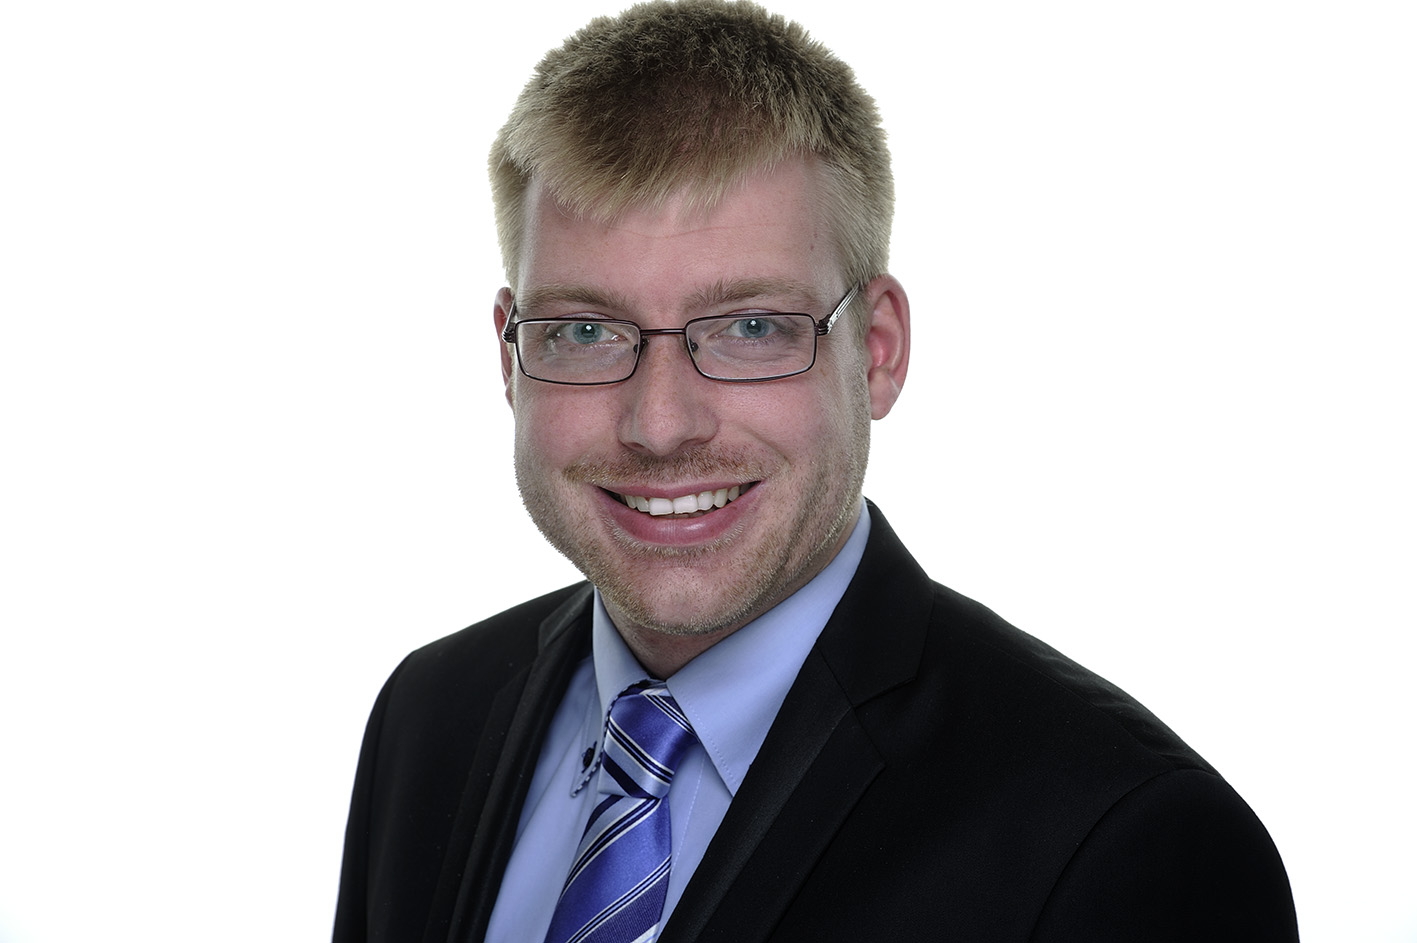 Herr Jens Uphoff ist am 08.05.2017 zum Steuerberater bestellt worden.